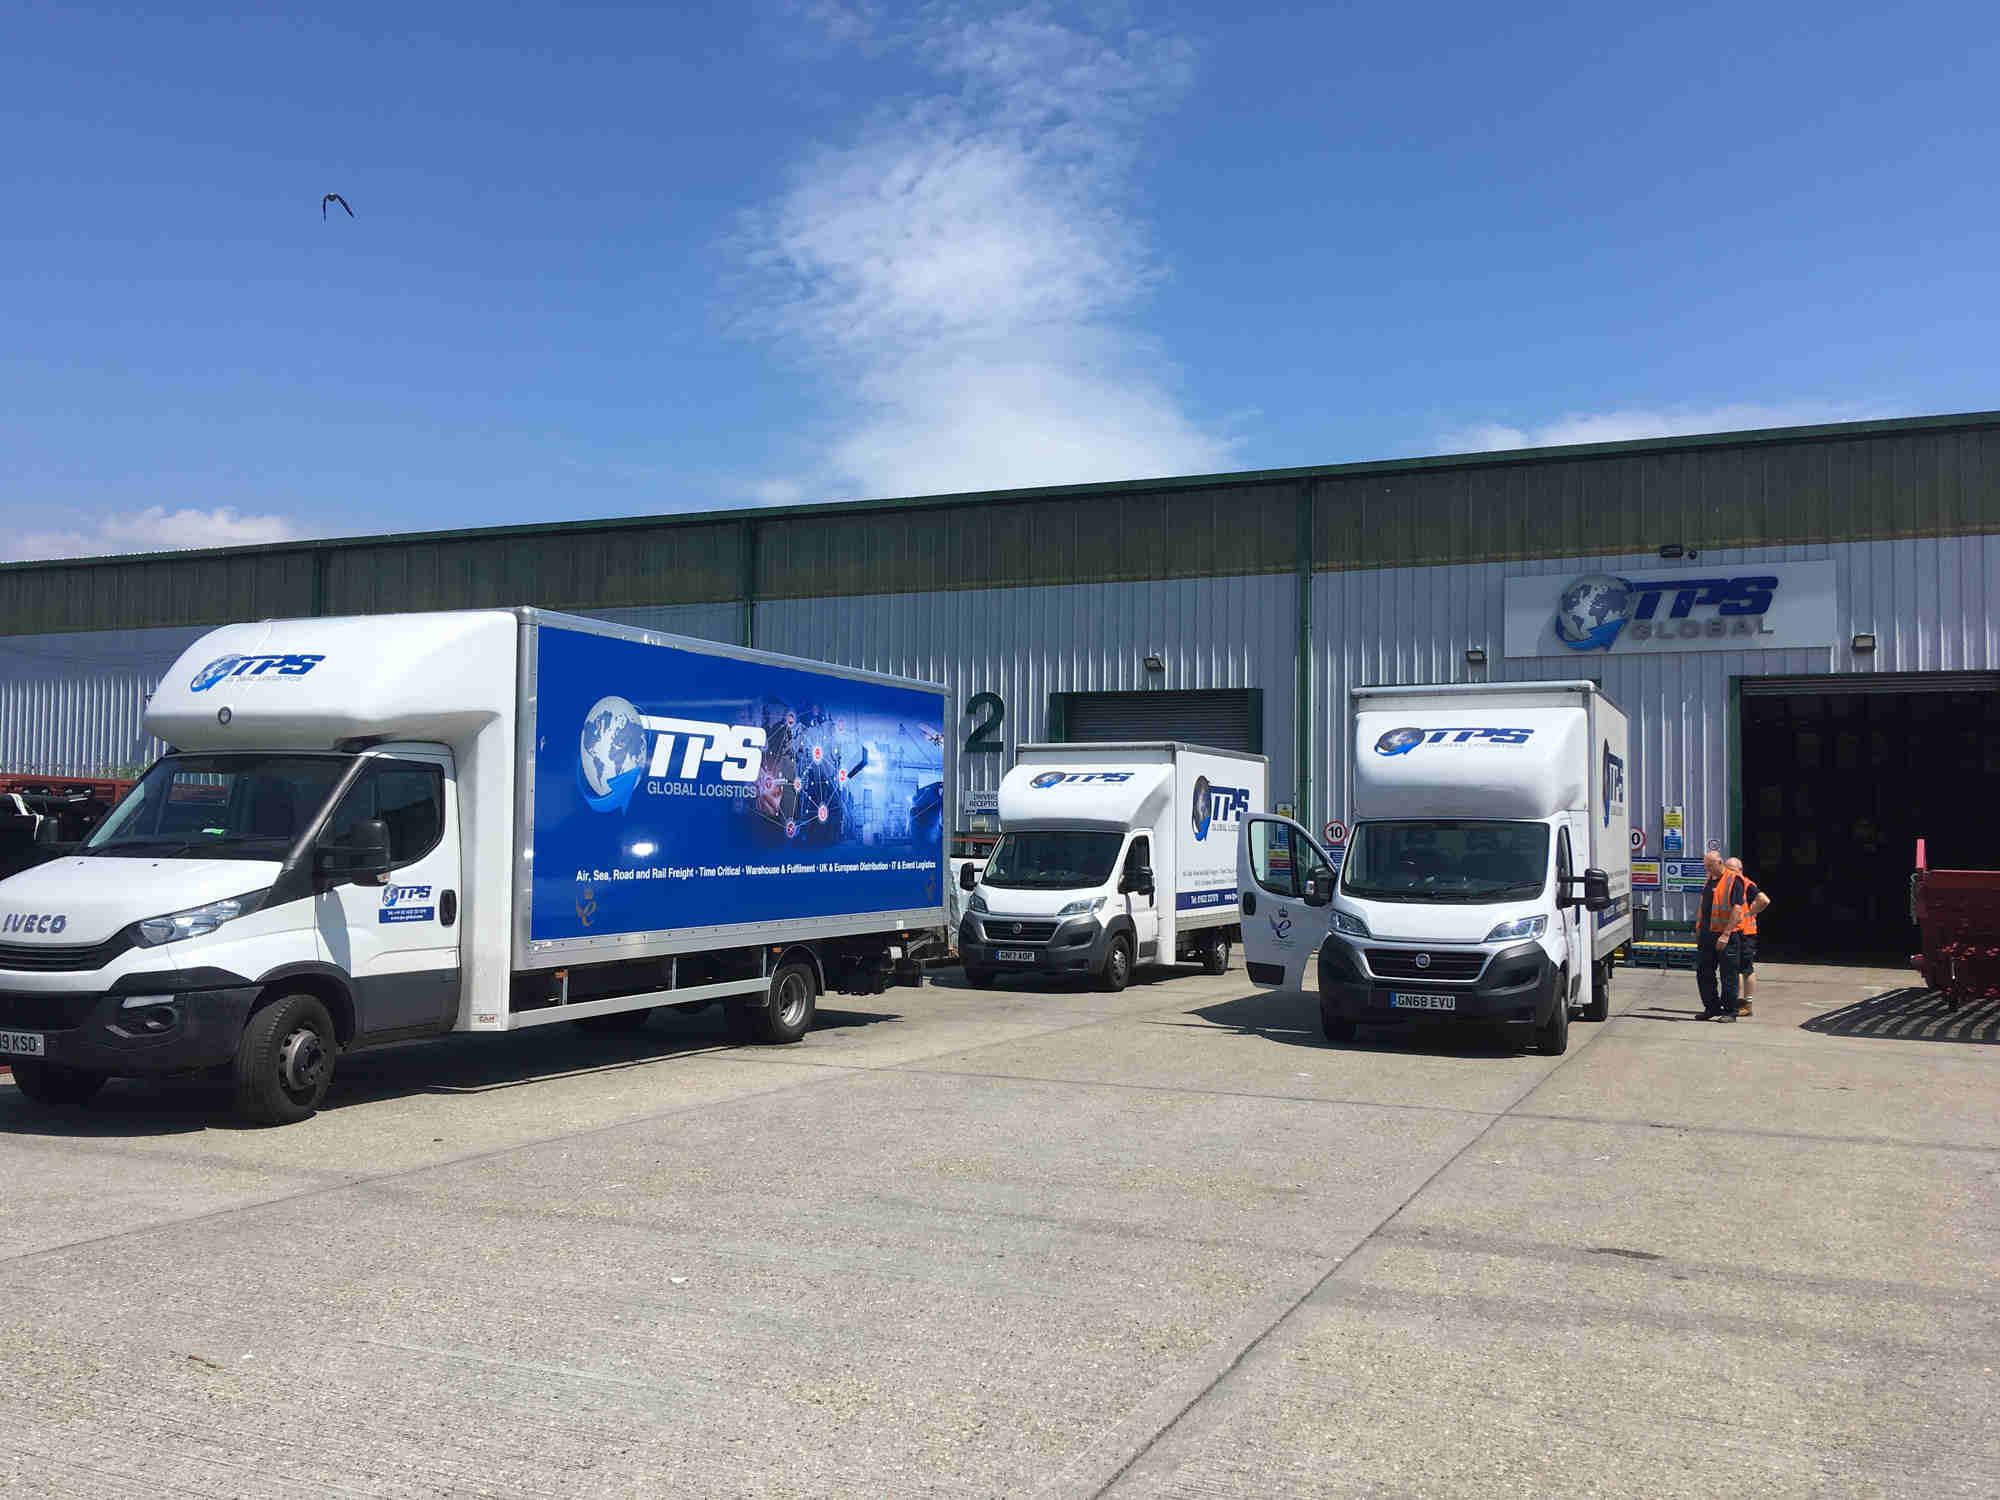 TPS-Global-Logistics-vehicles-and-seagull